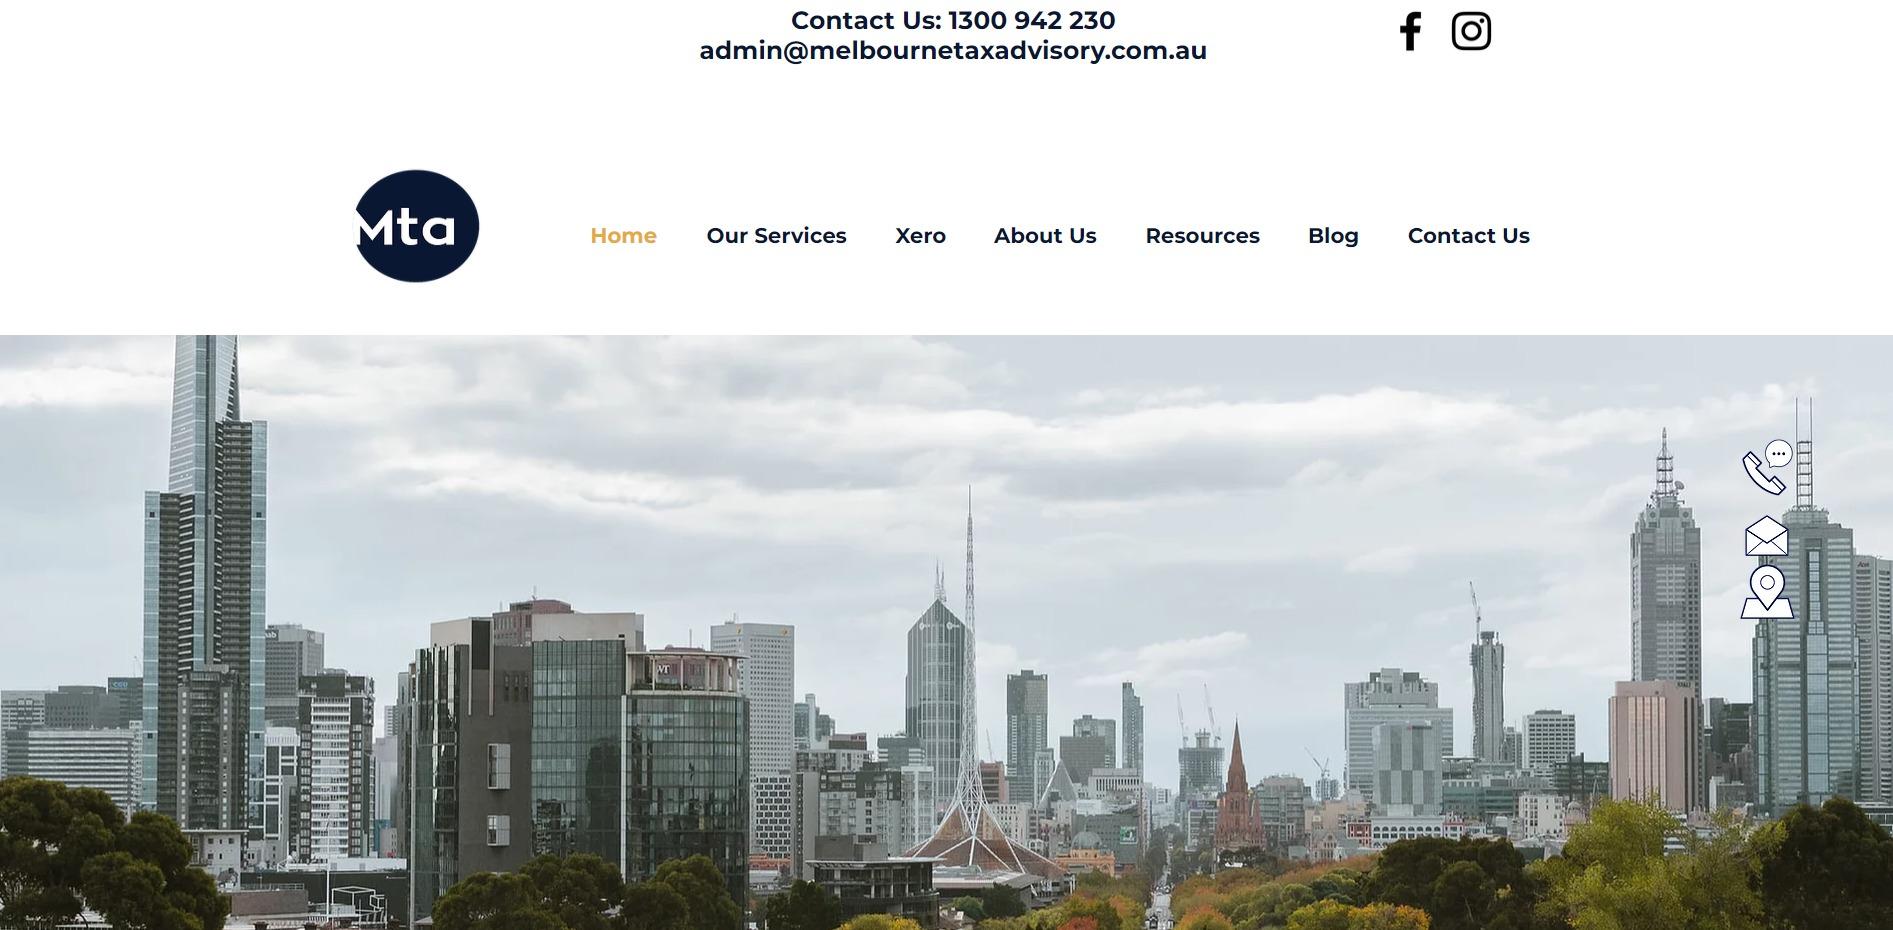 Melbourne Tax Advisory